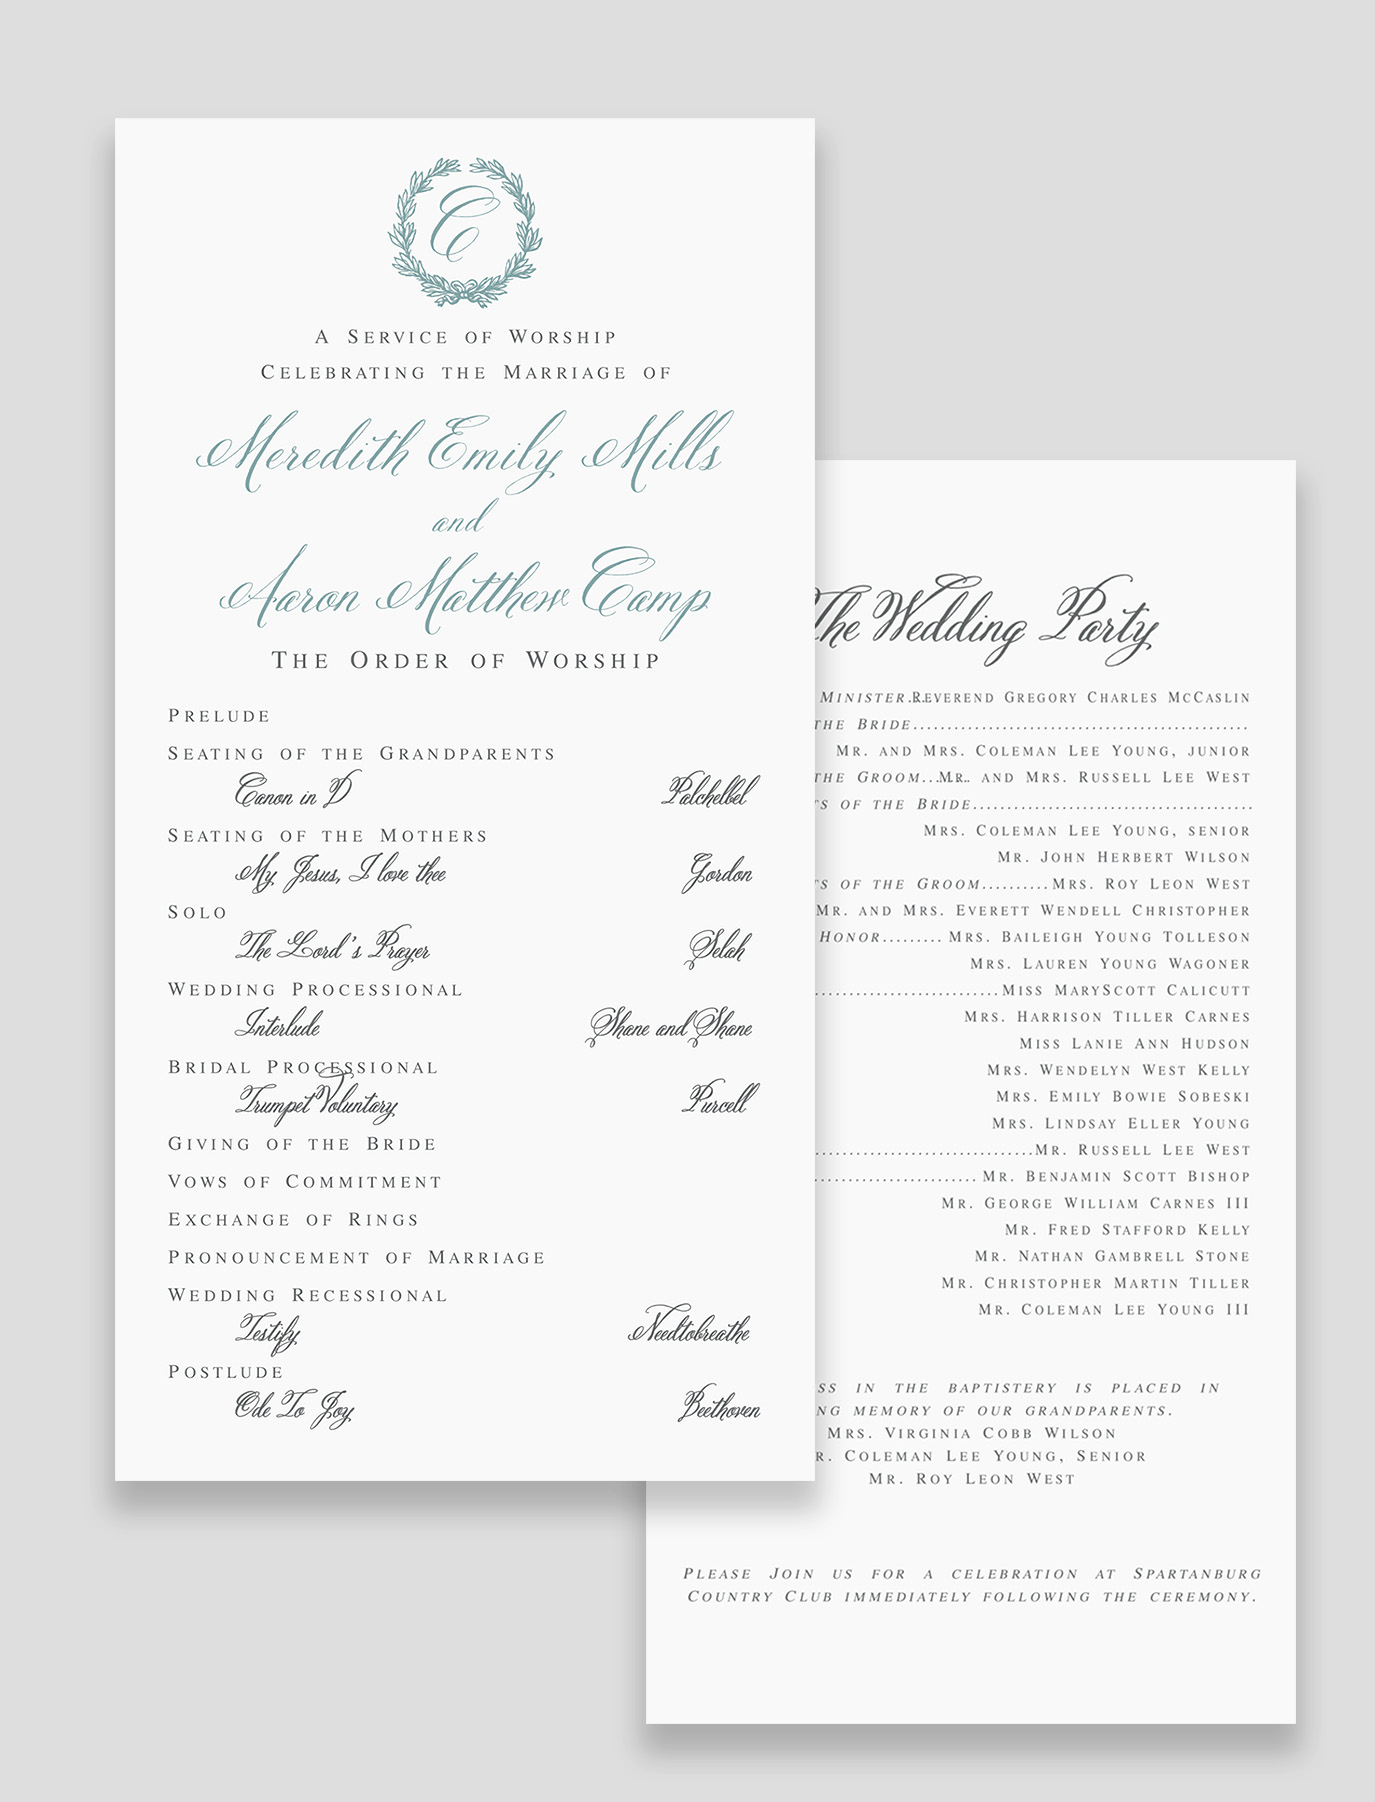 The Virginia Suite Ceremony Program